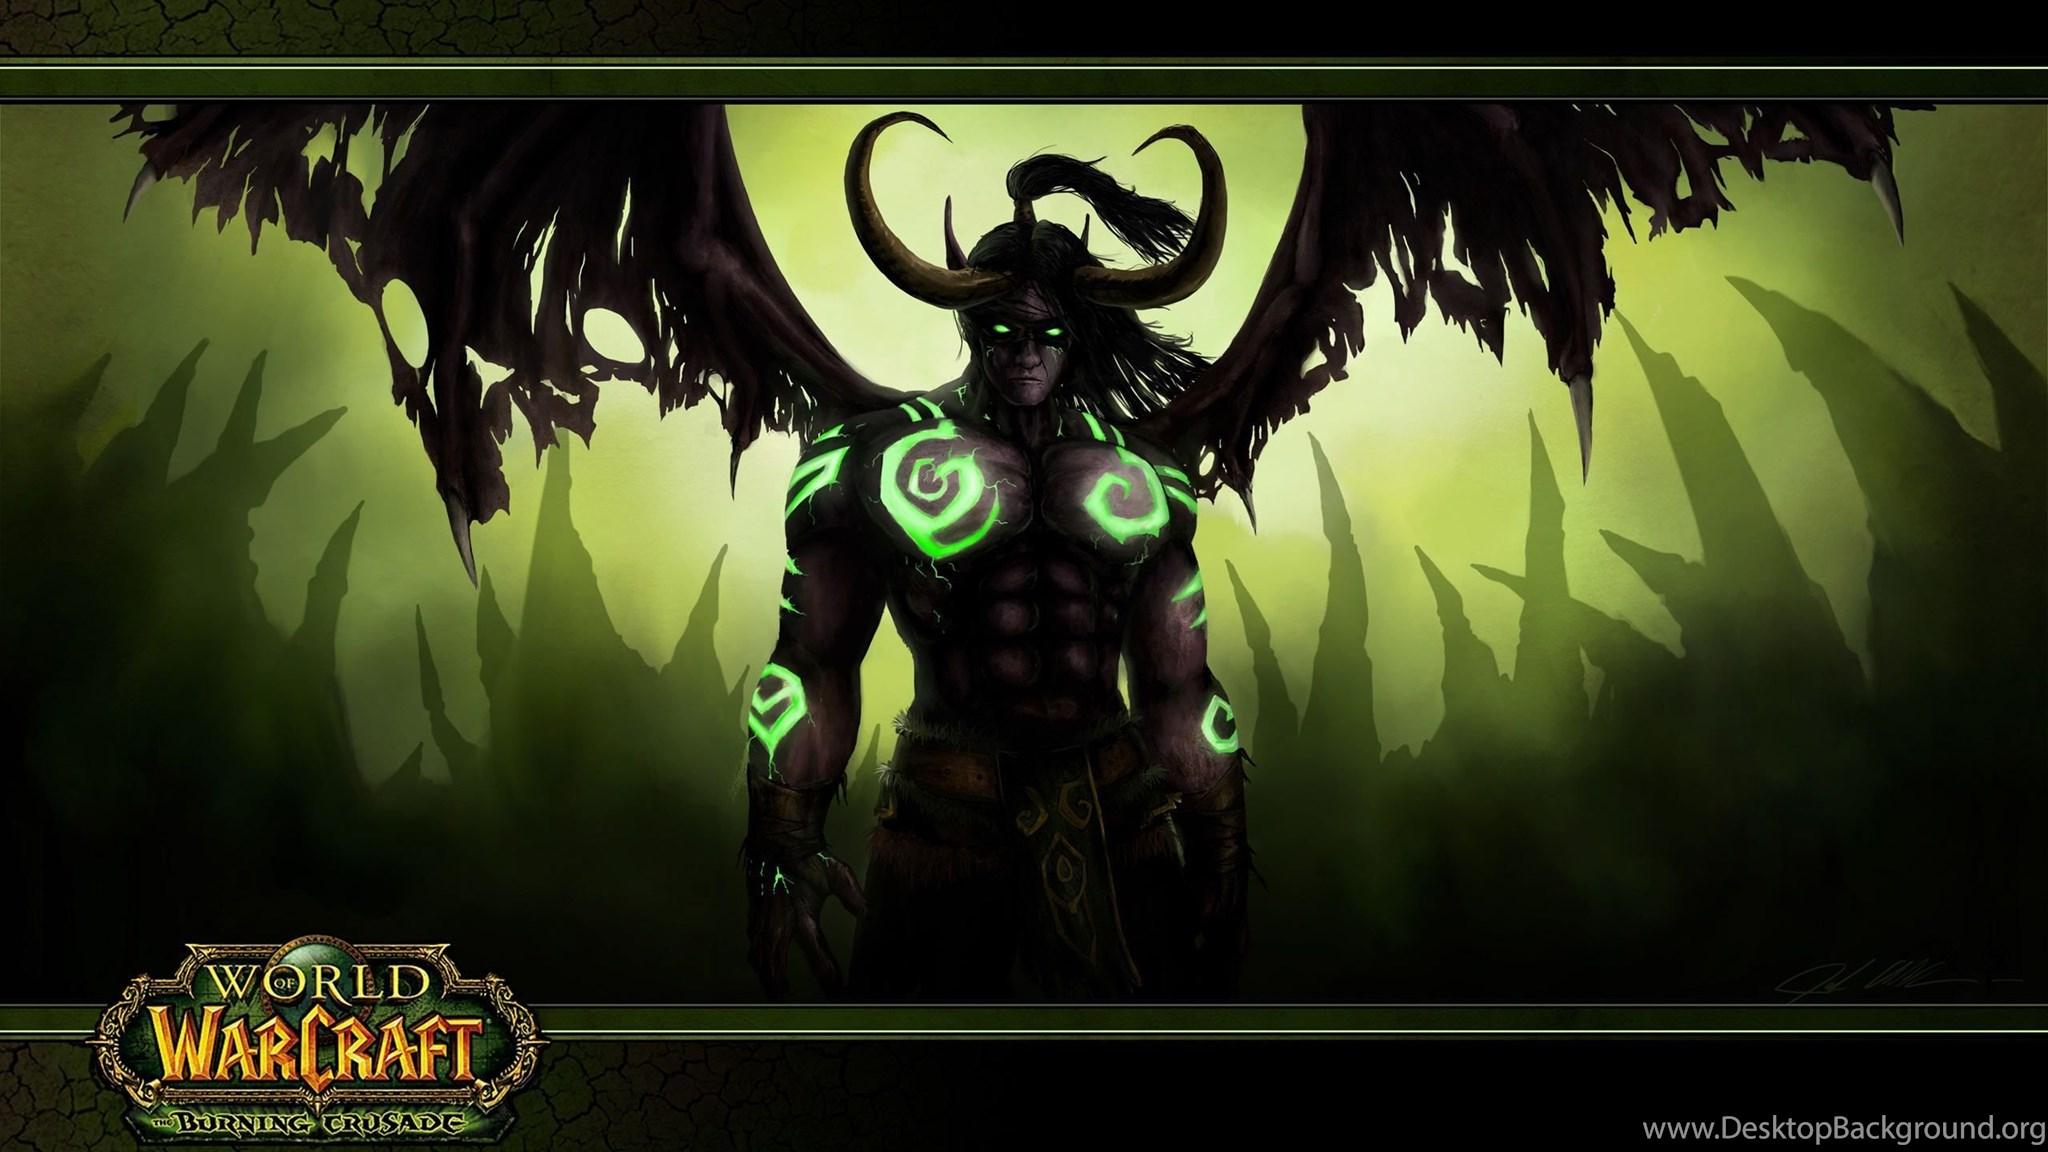 22 World Of Warcraft The Burning Crusade Hd Wallpapers Desktop